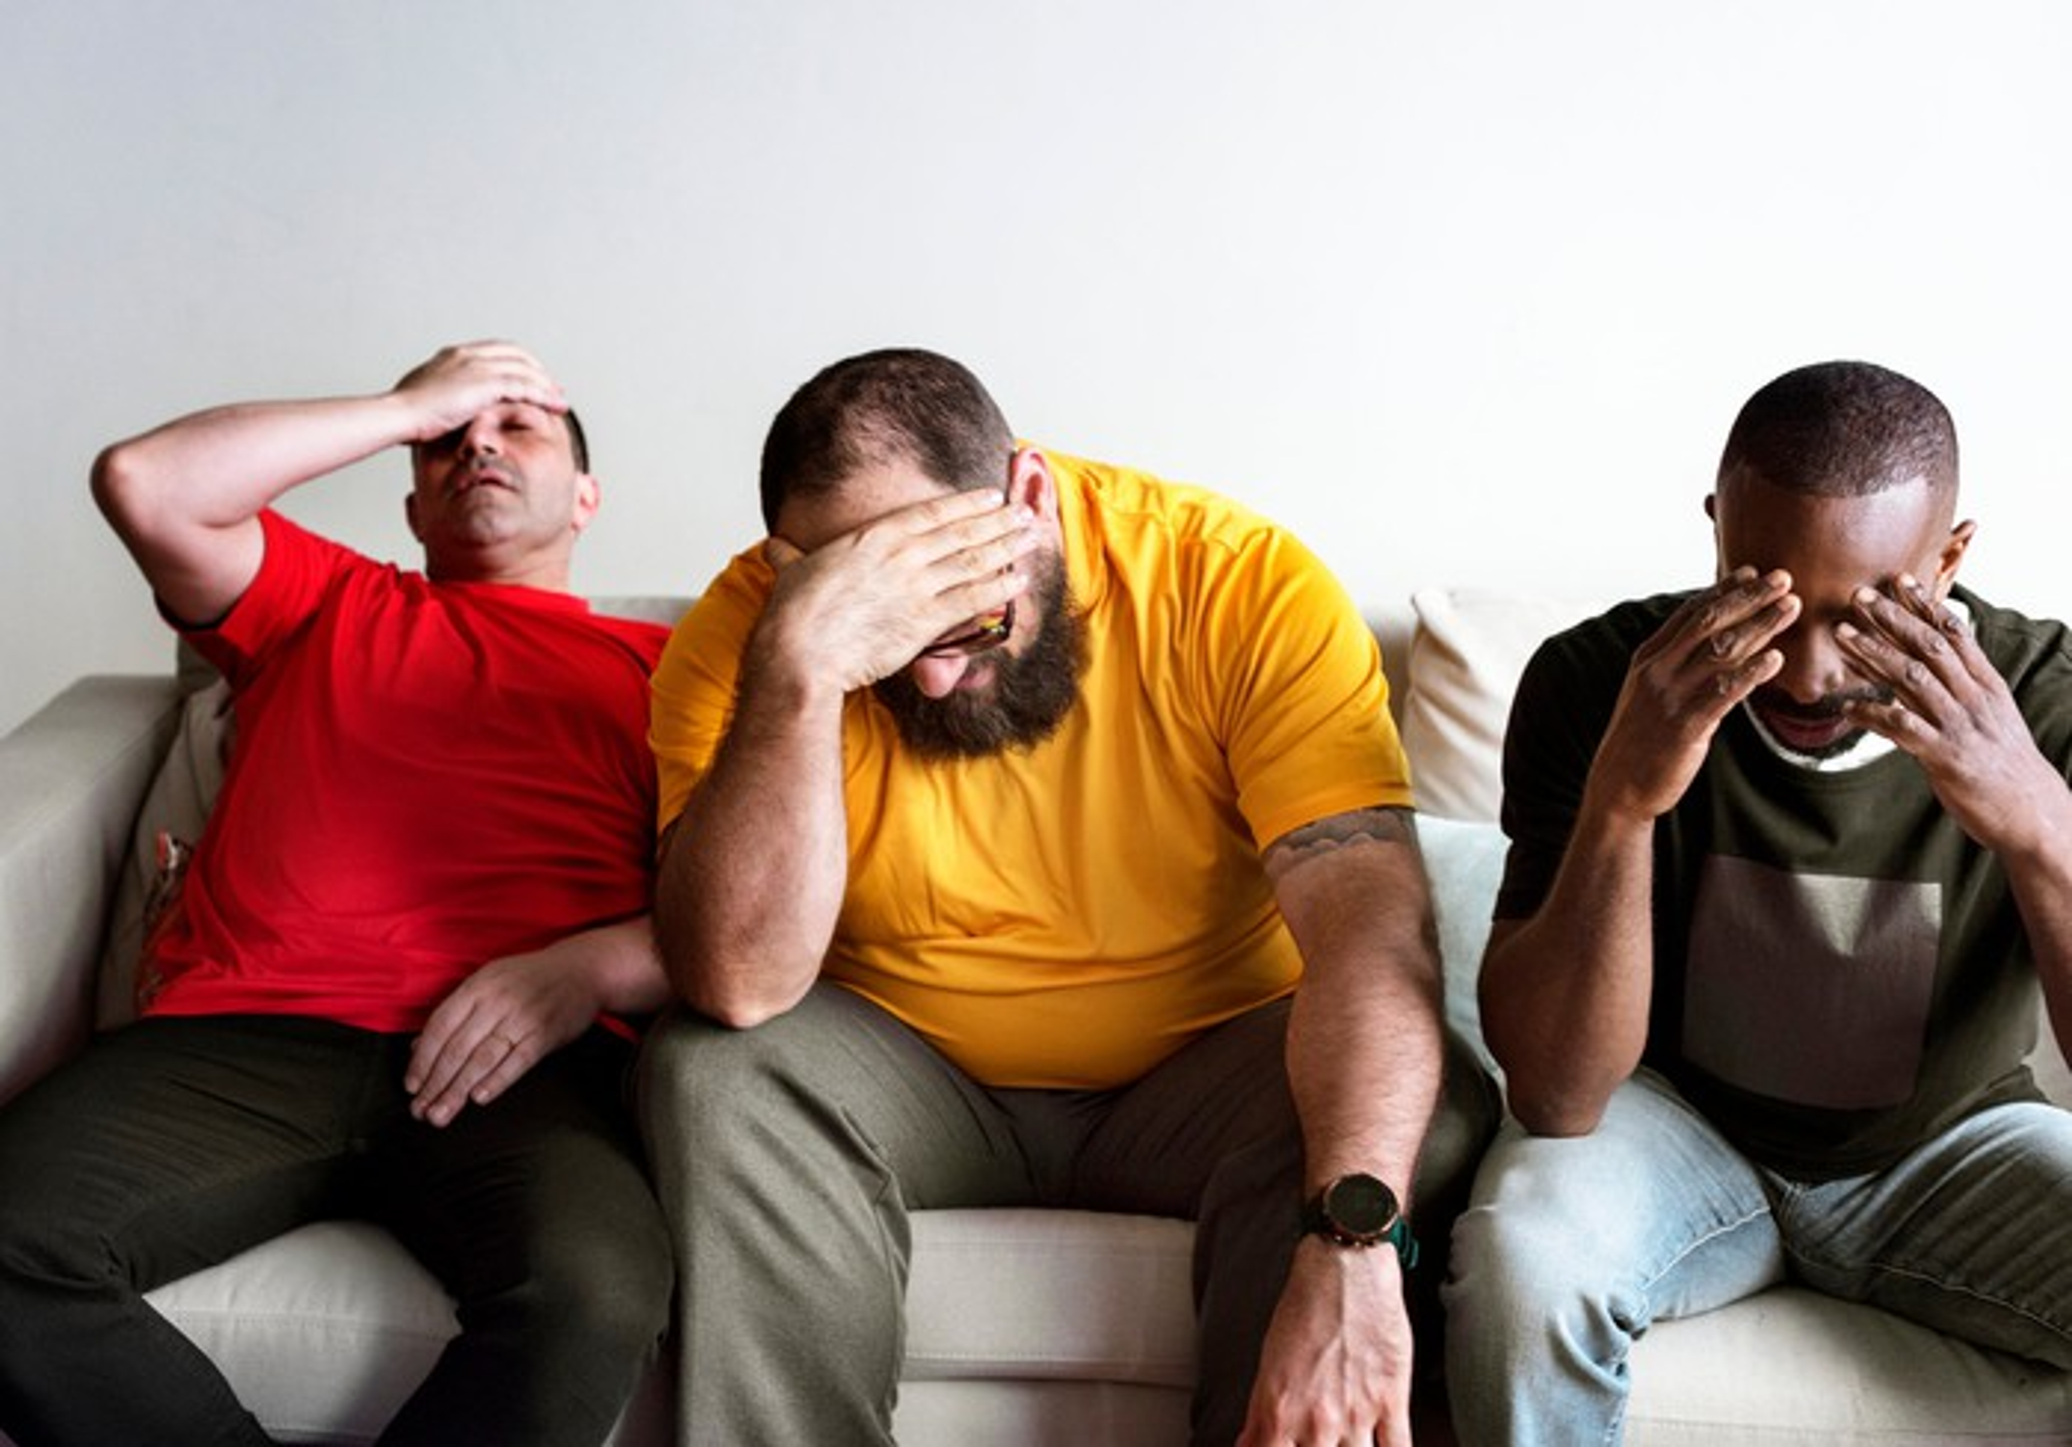 Three distressed looking people on a sofa.